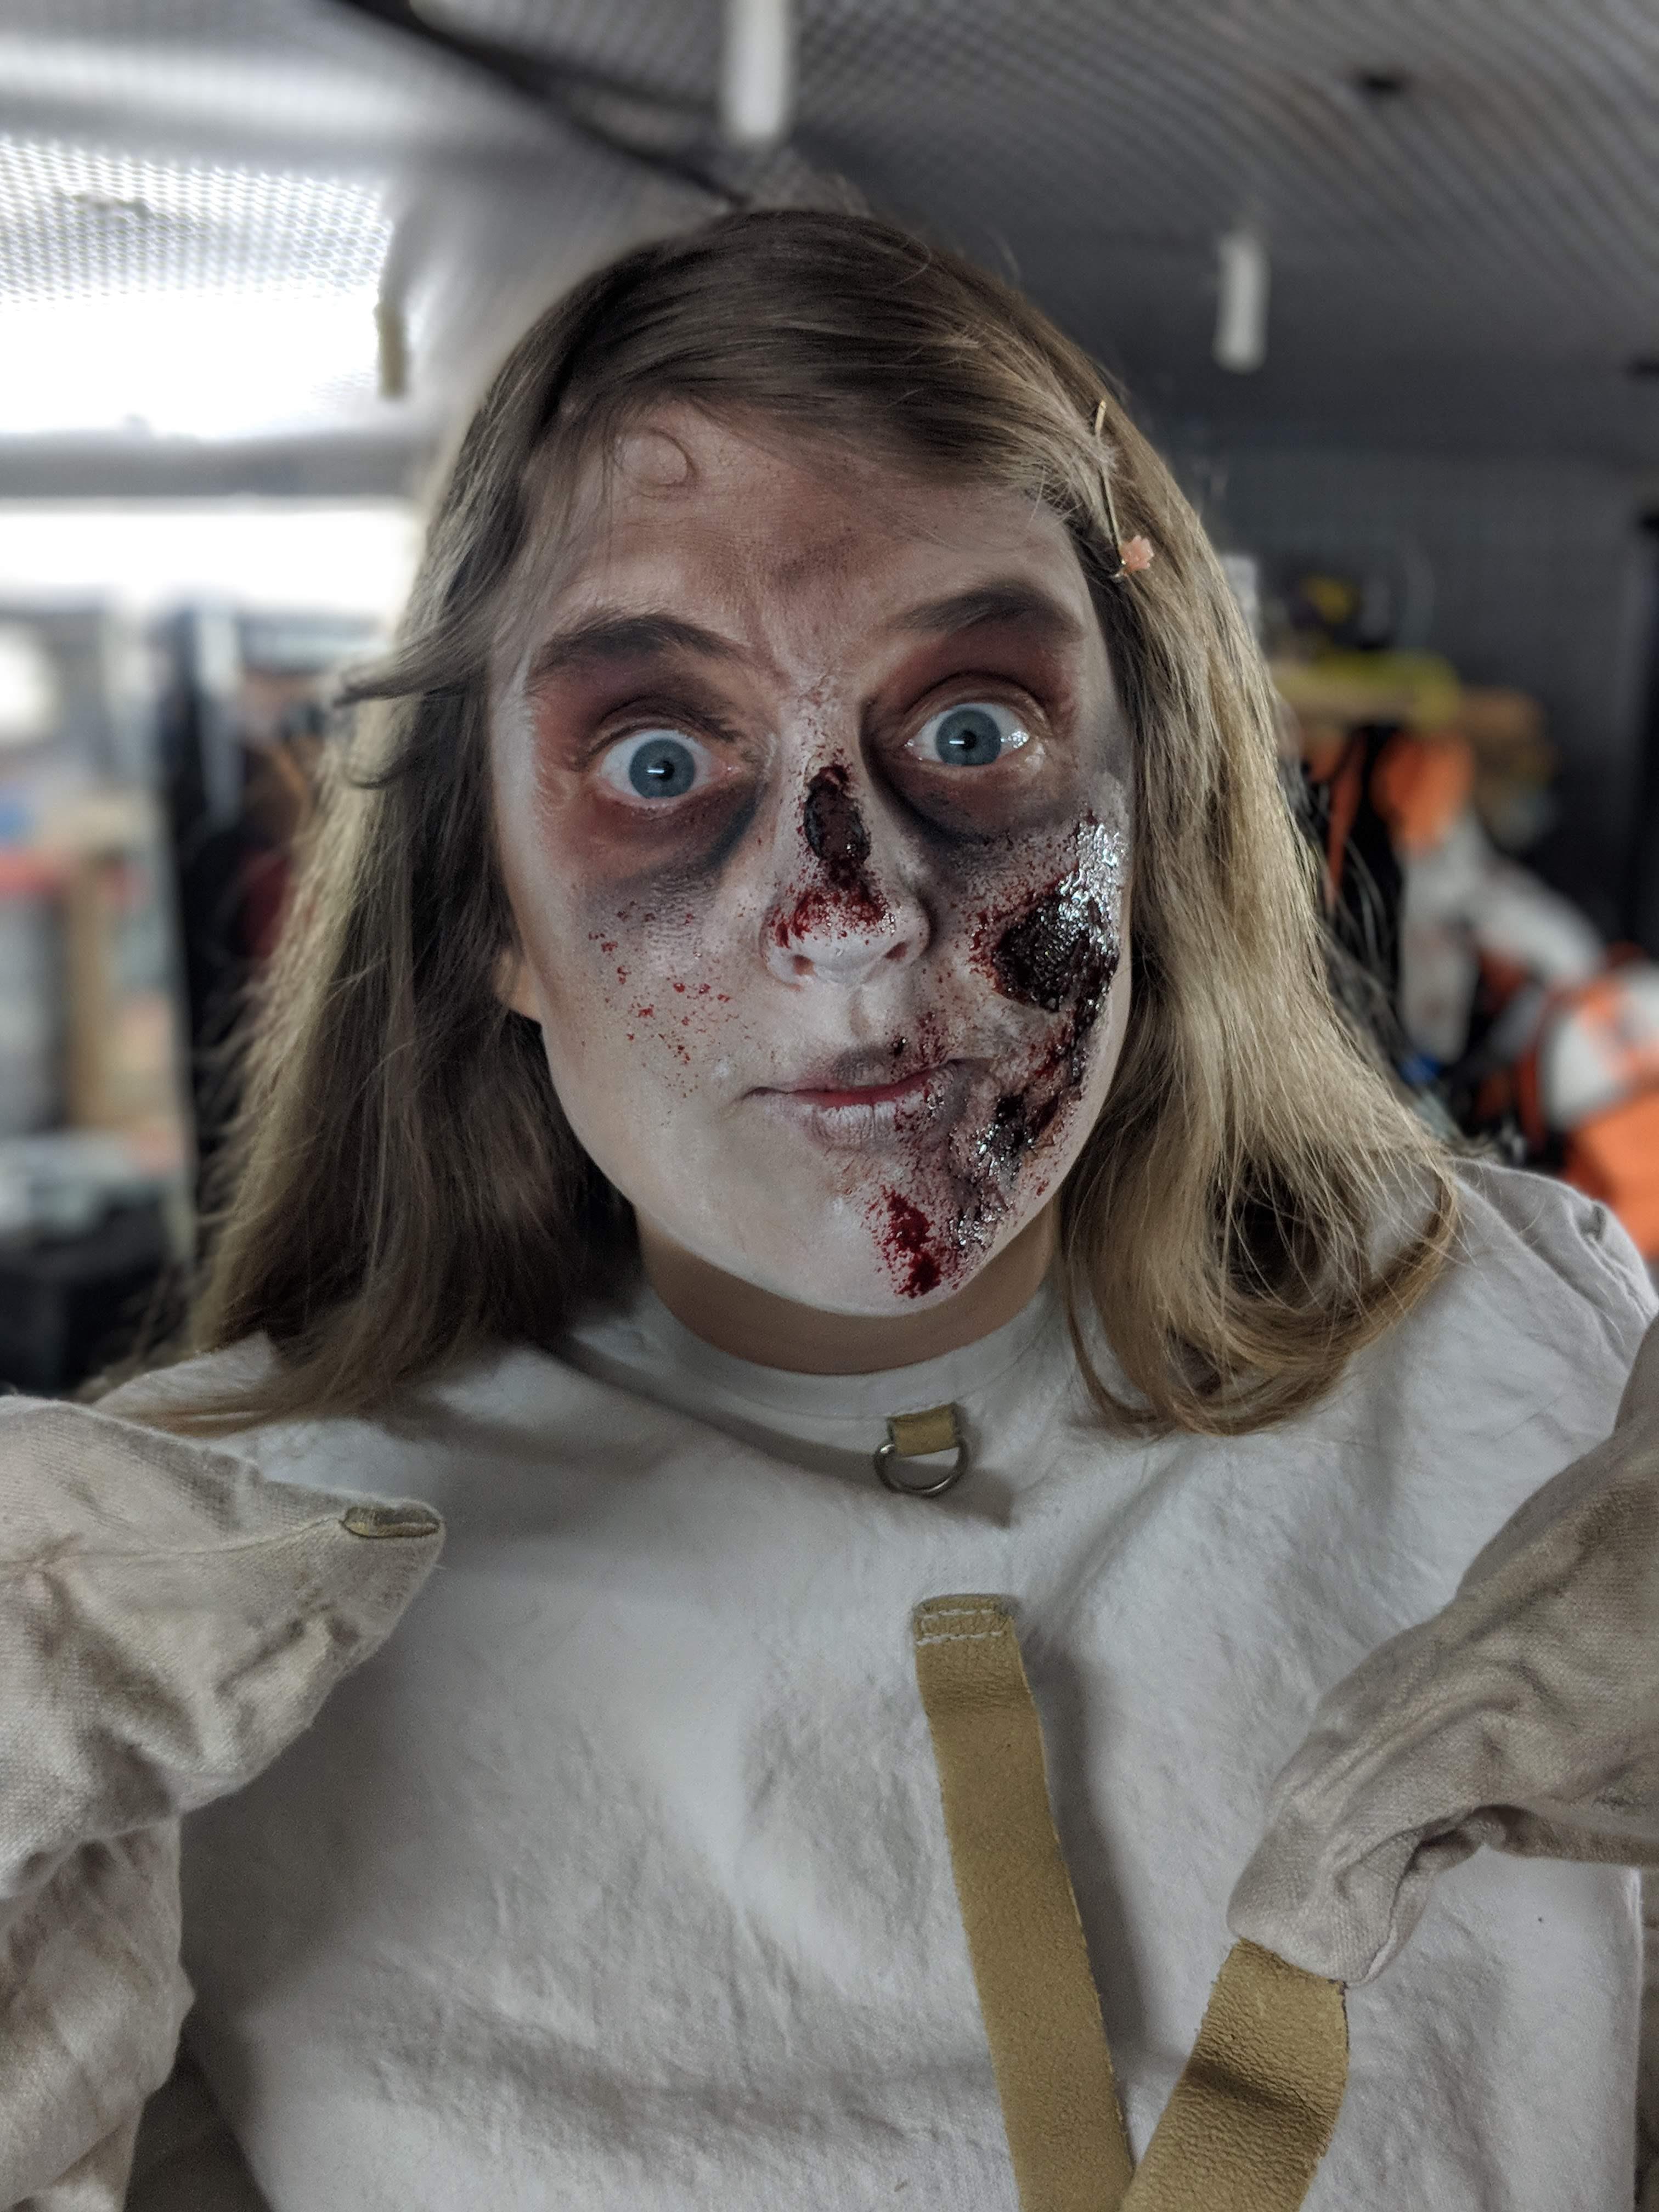 London Tombs - Joanne as a zombie